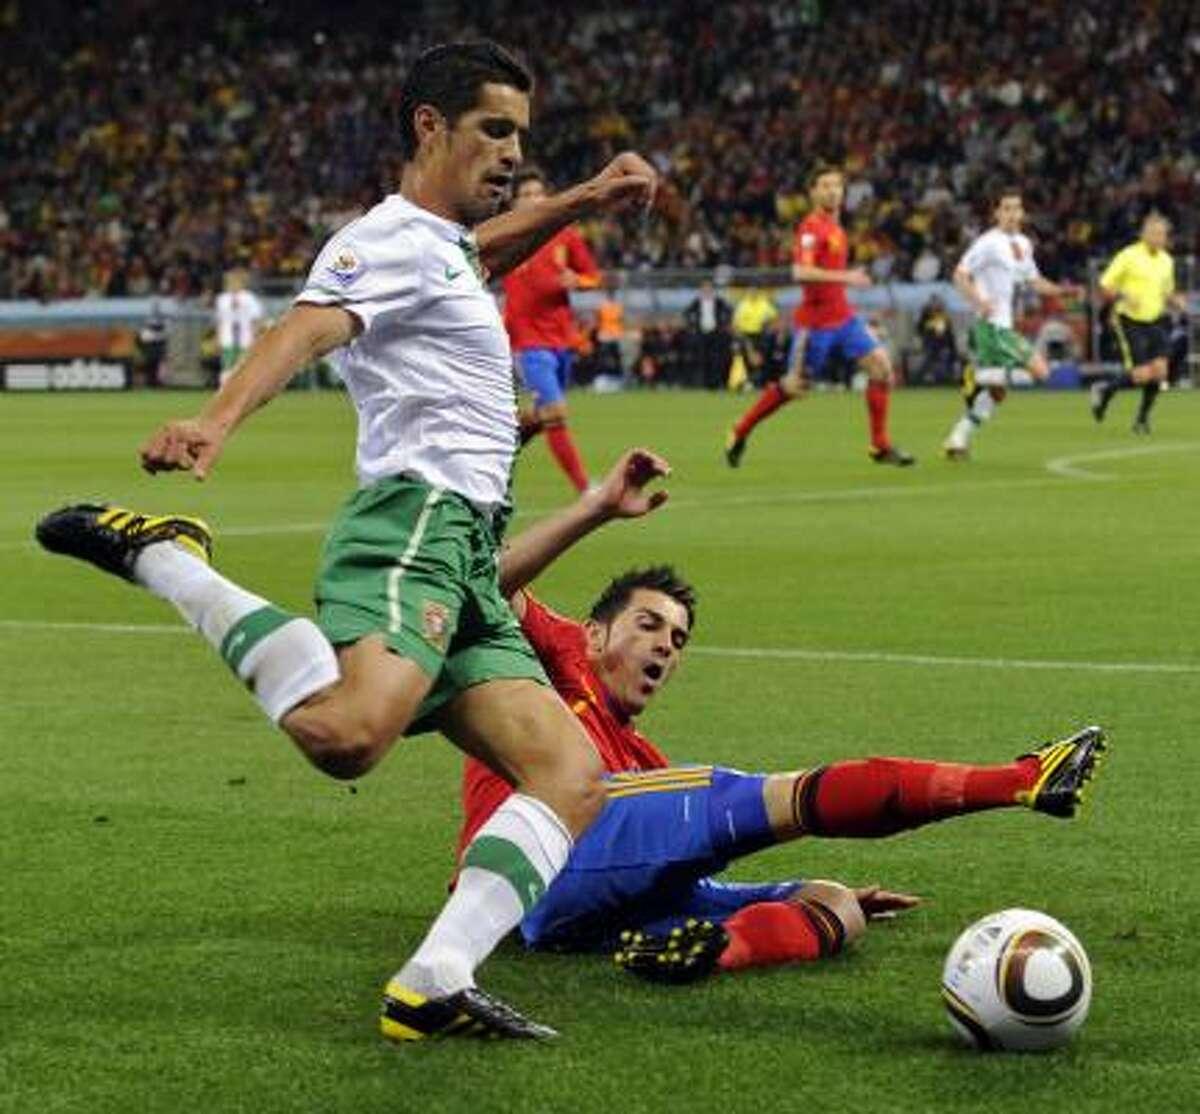 Portugal's Ricardo Costa goes to kick the ball as Spain's David Villa tries to block him.